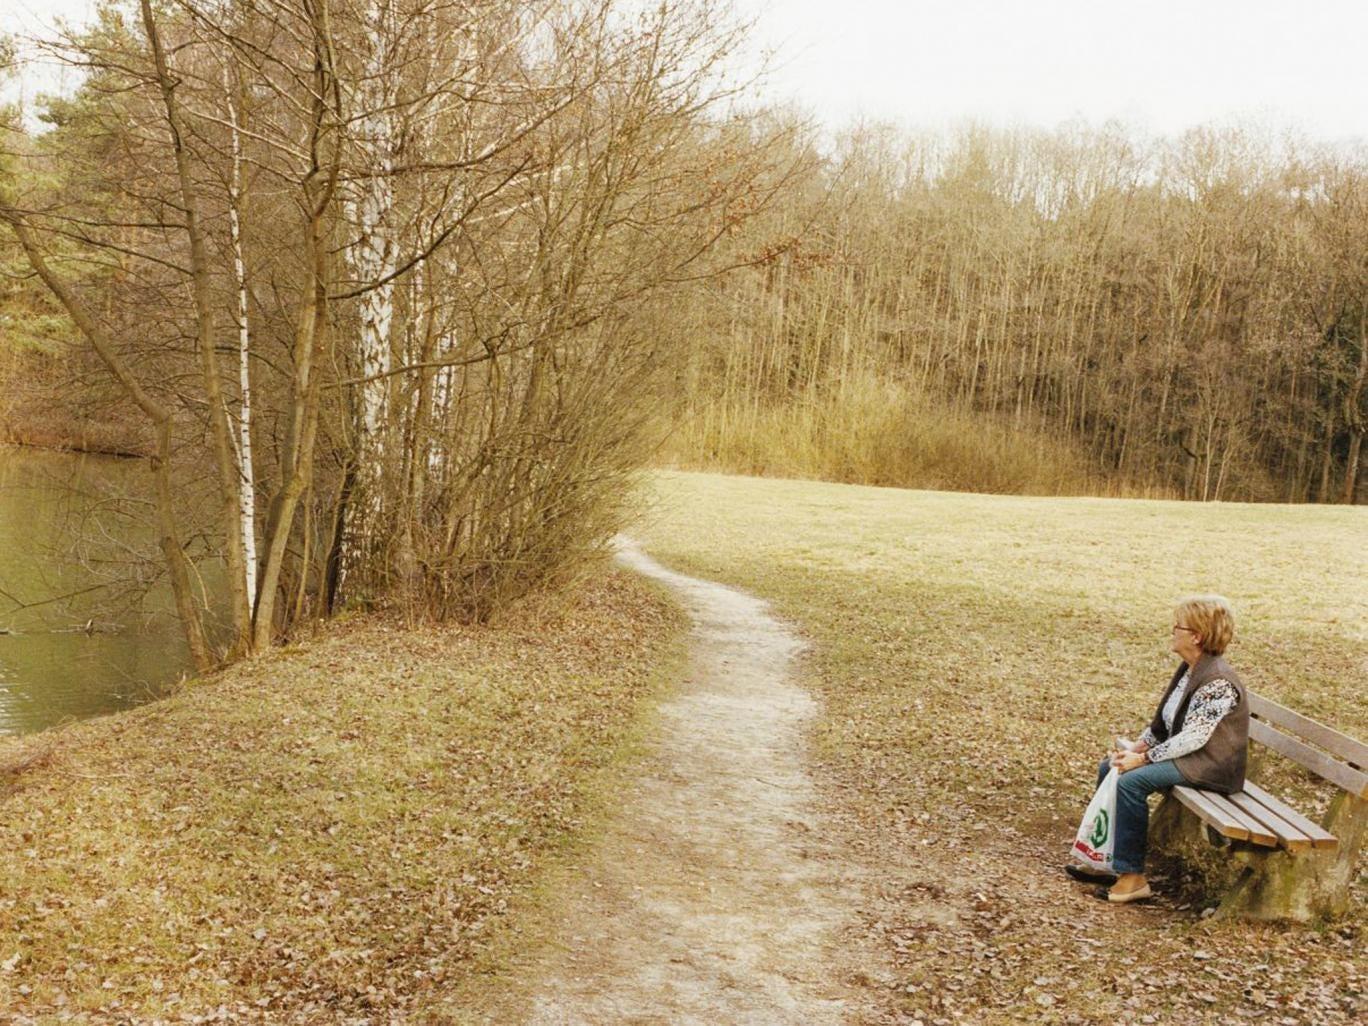 Irene im Wald (2012)